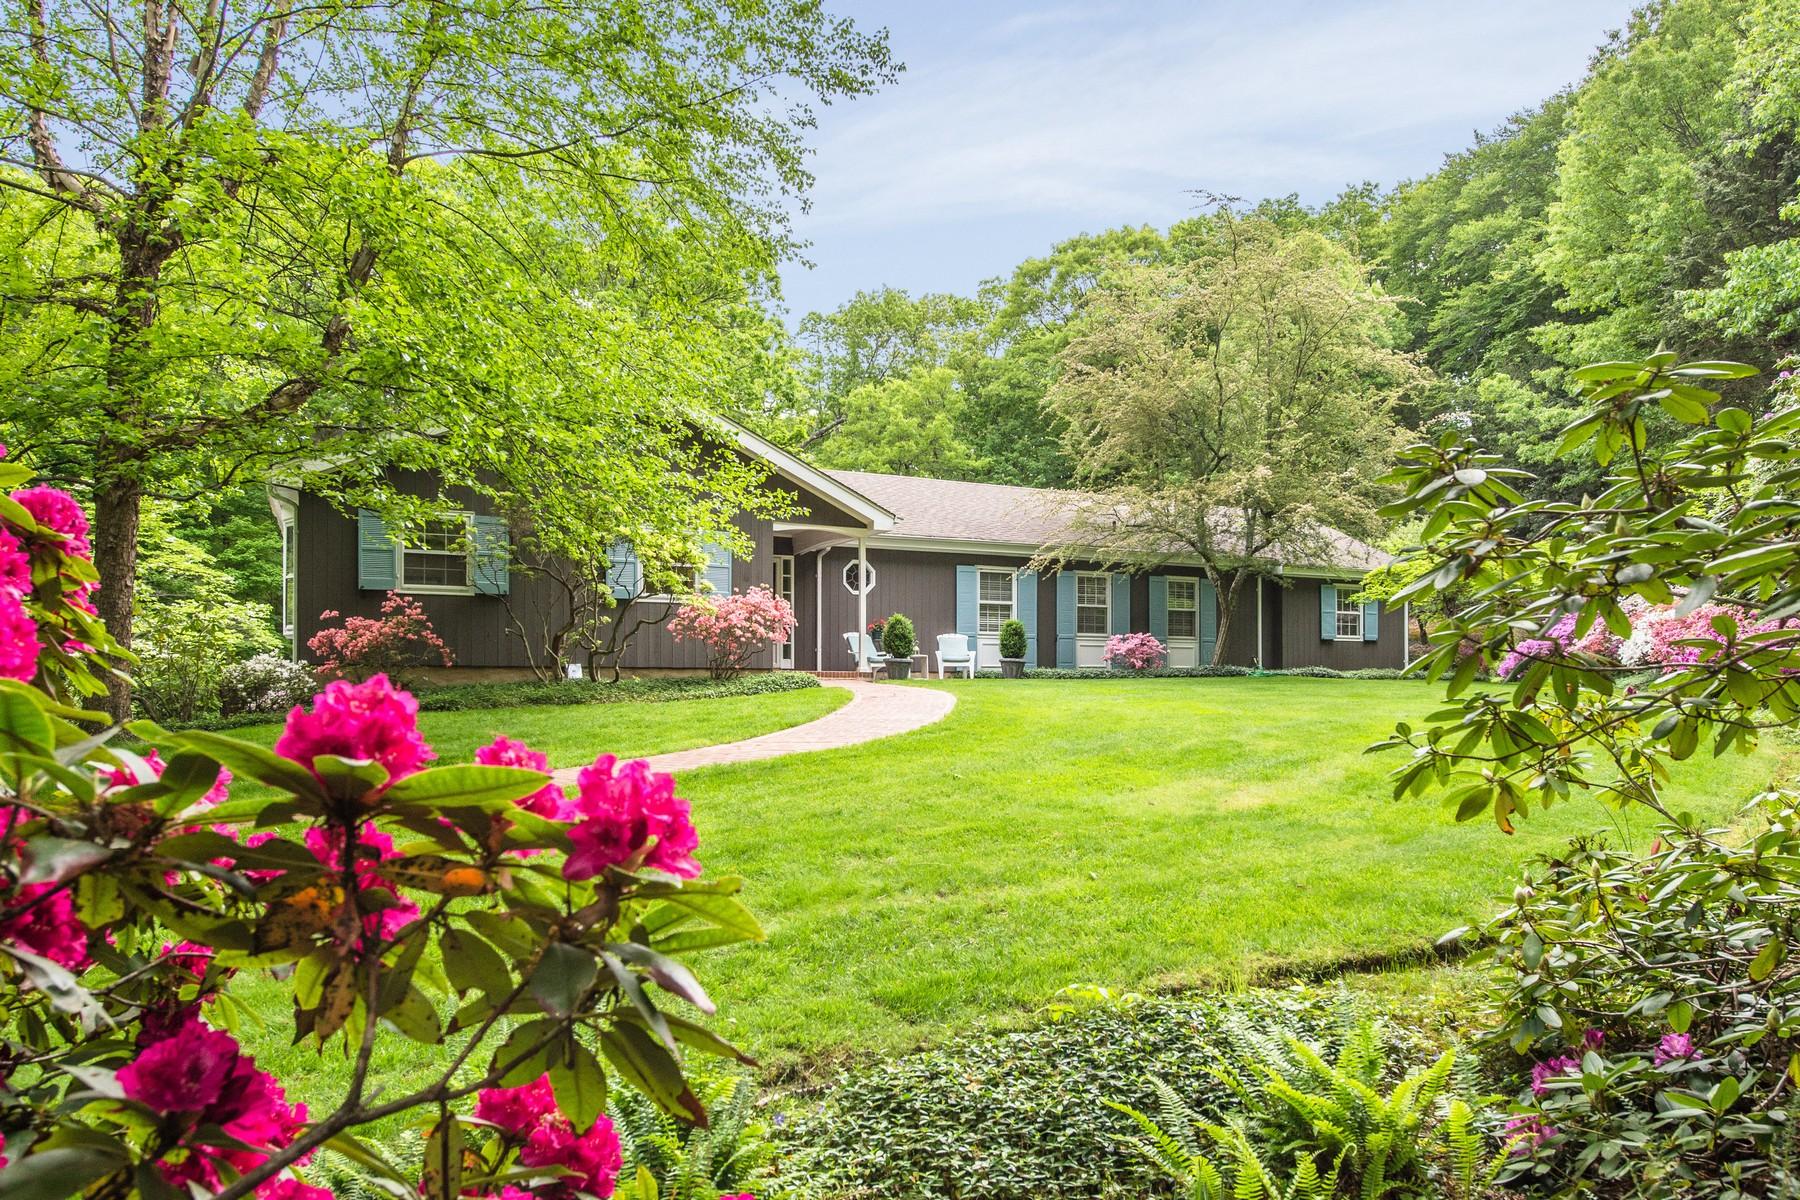 Casa para uma família para Venda às Farm Ranch 354 Ridge Ln Mill Neck, Nova York 11765 Estados Unidos